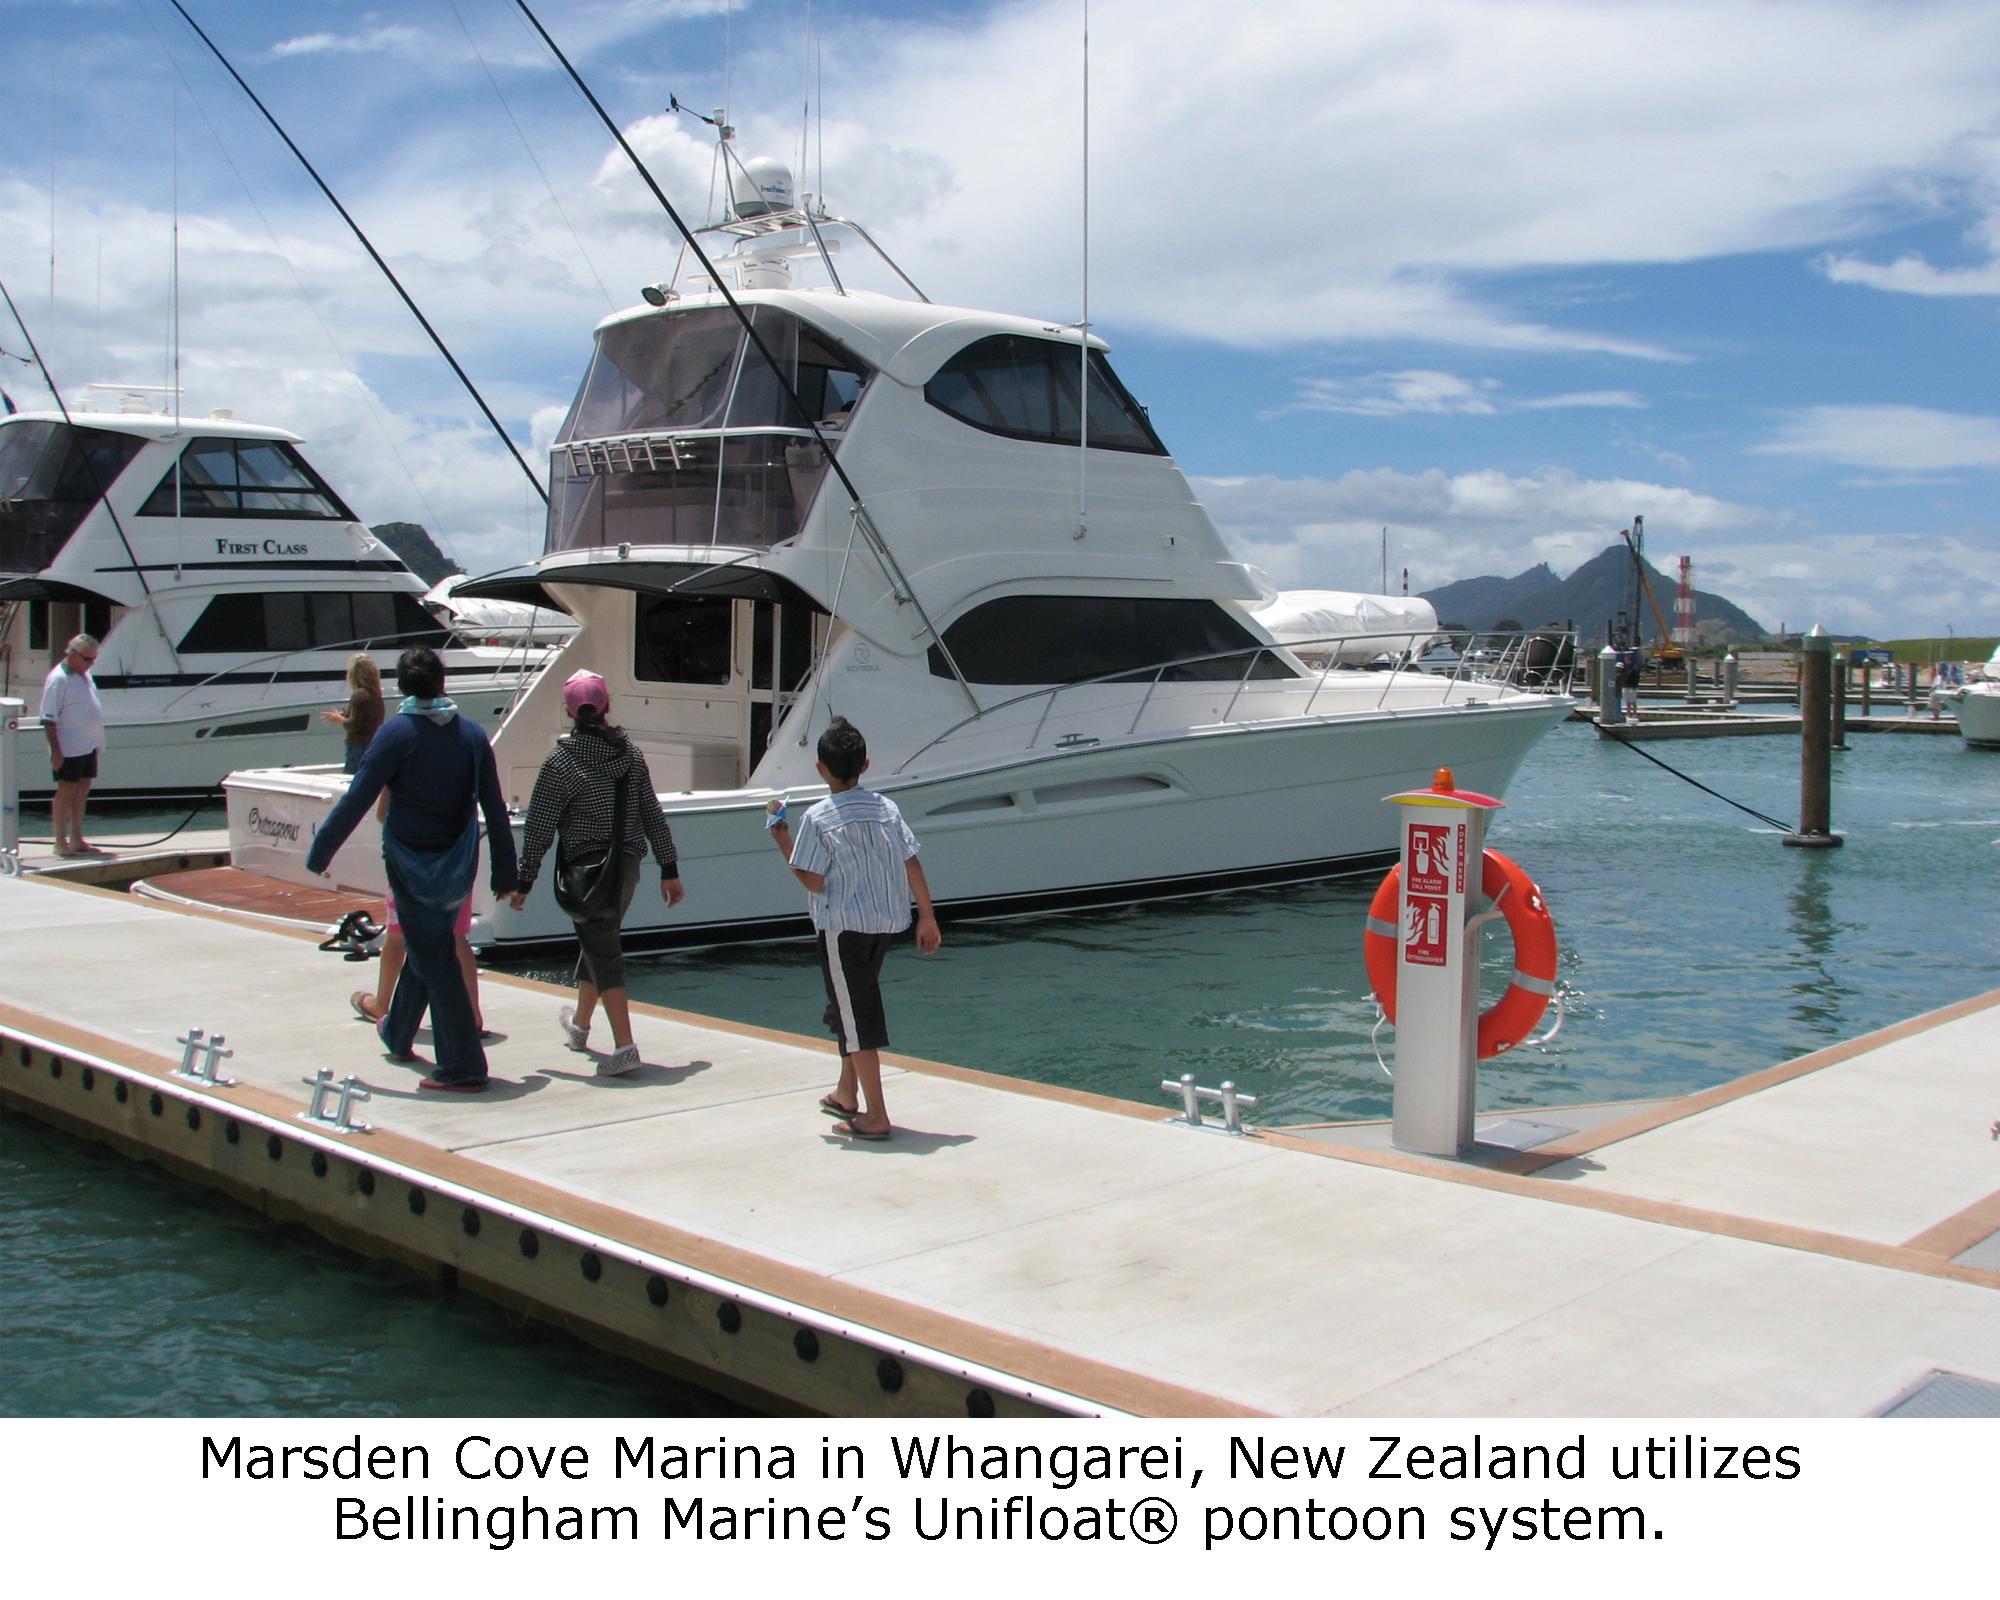 WORLD CLASS MARINA OPENS IN NEW ZEALAND'S NORTHLAND